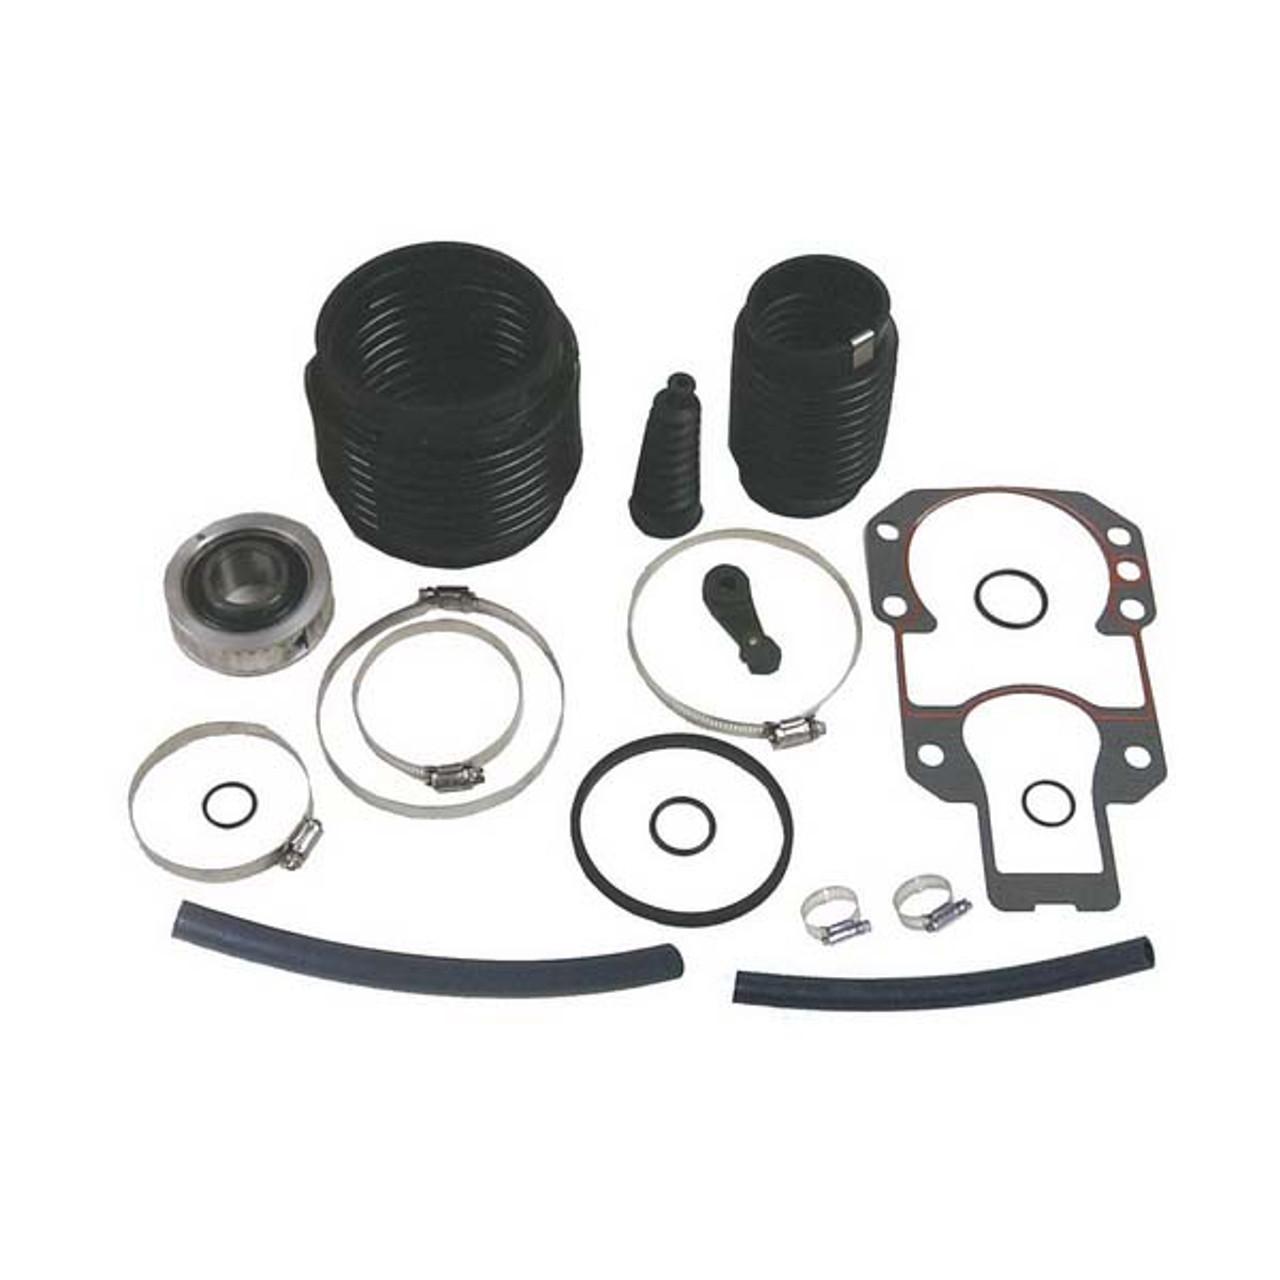 Sierra 18-2601-1 Transom Seal Kit